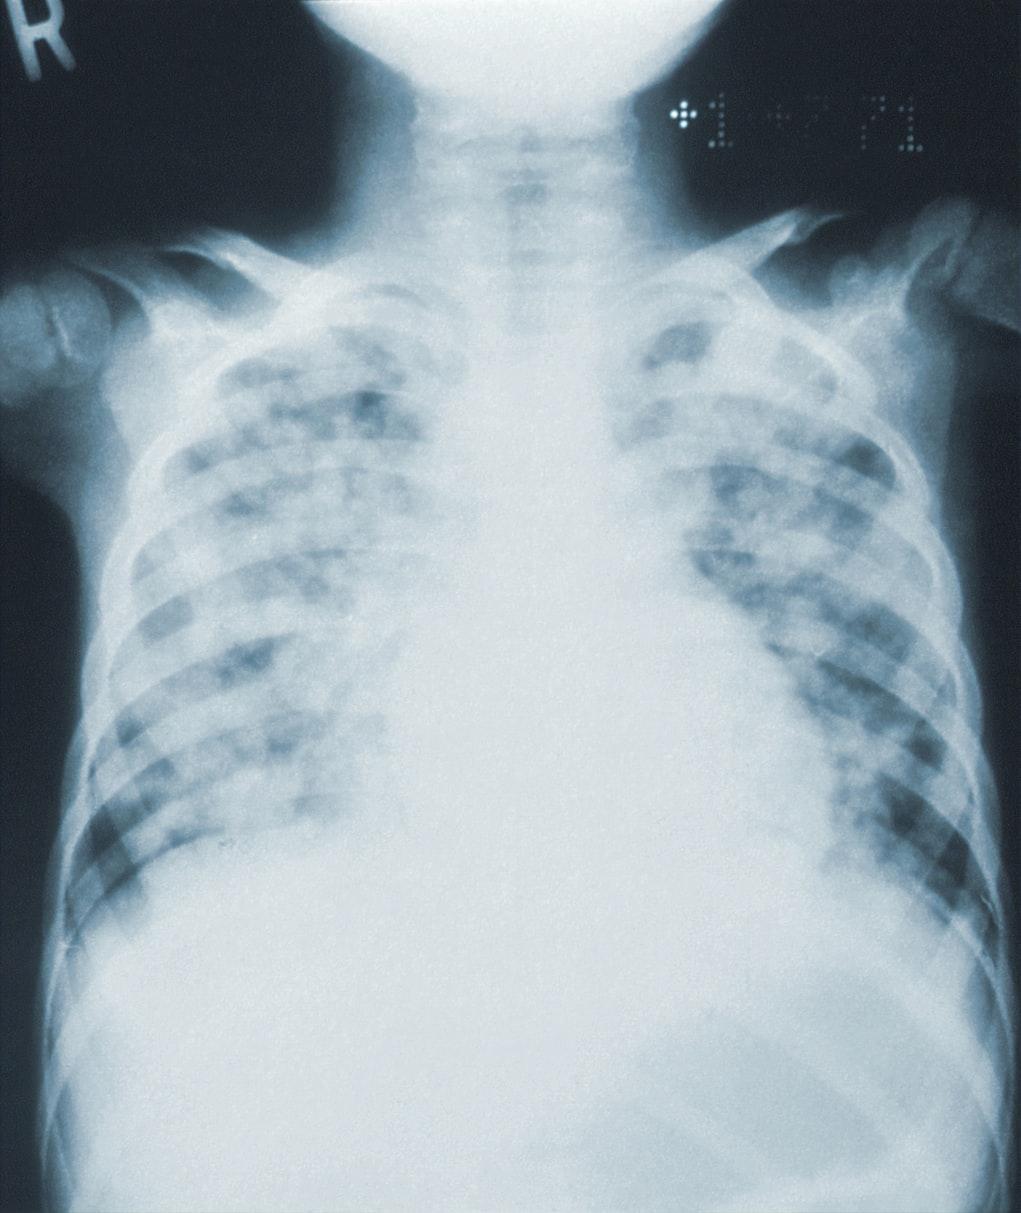 Pneumonia on X-ray